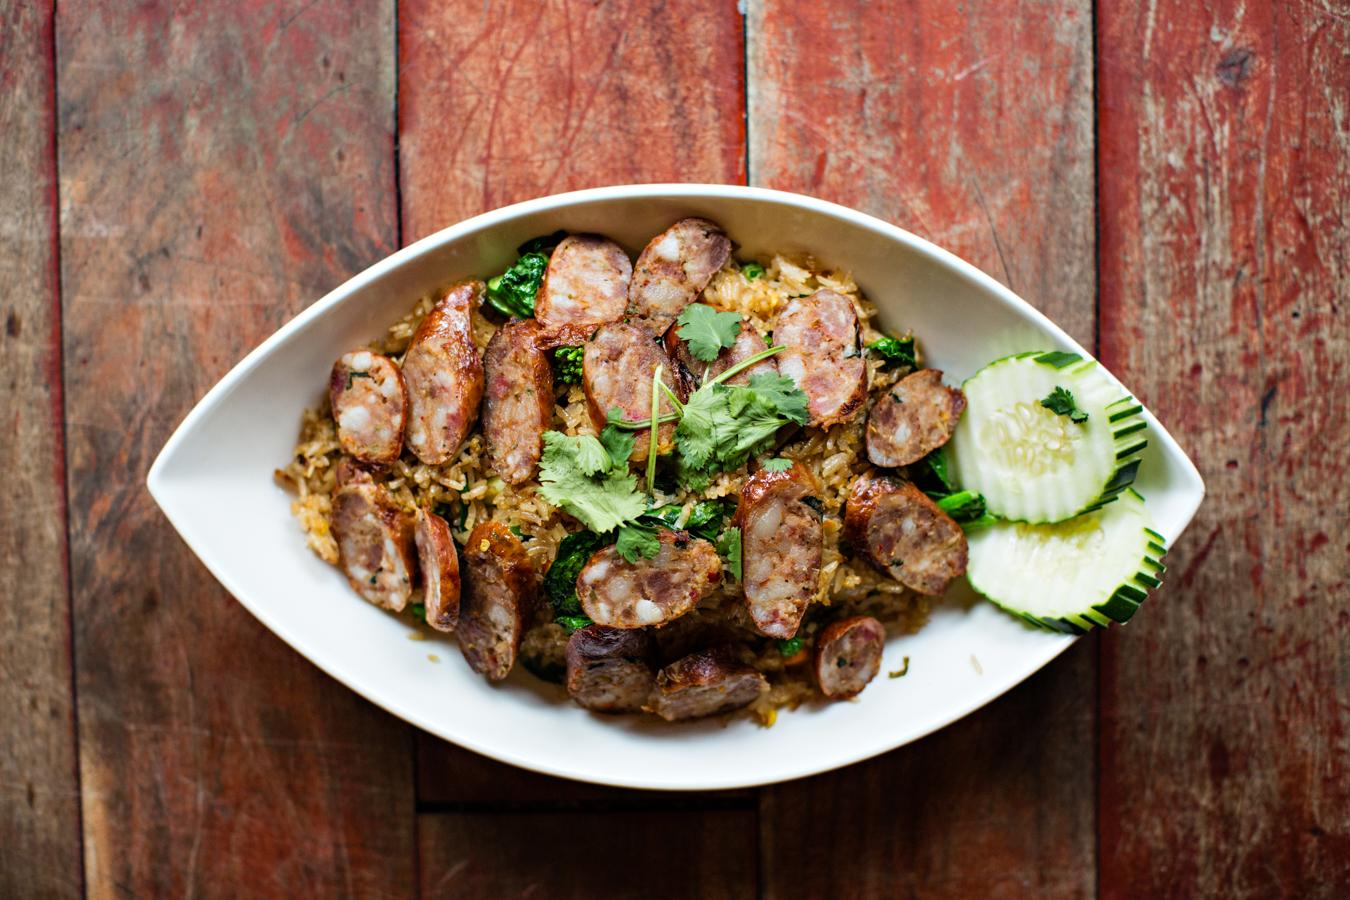 E san thai cuisine in portland or 97204 for Thailande cuisine